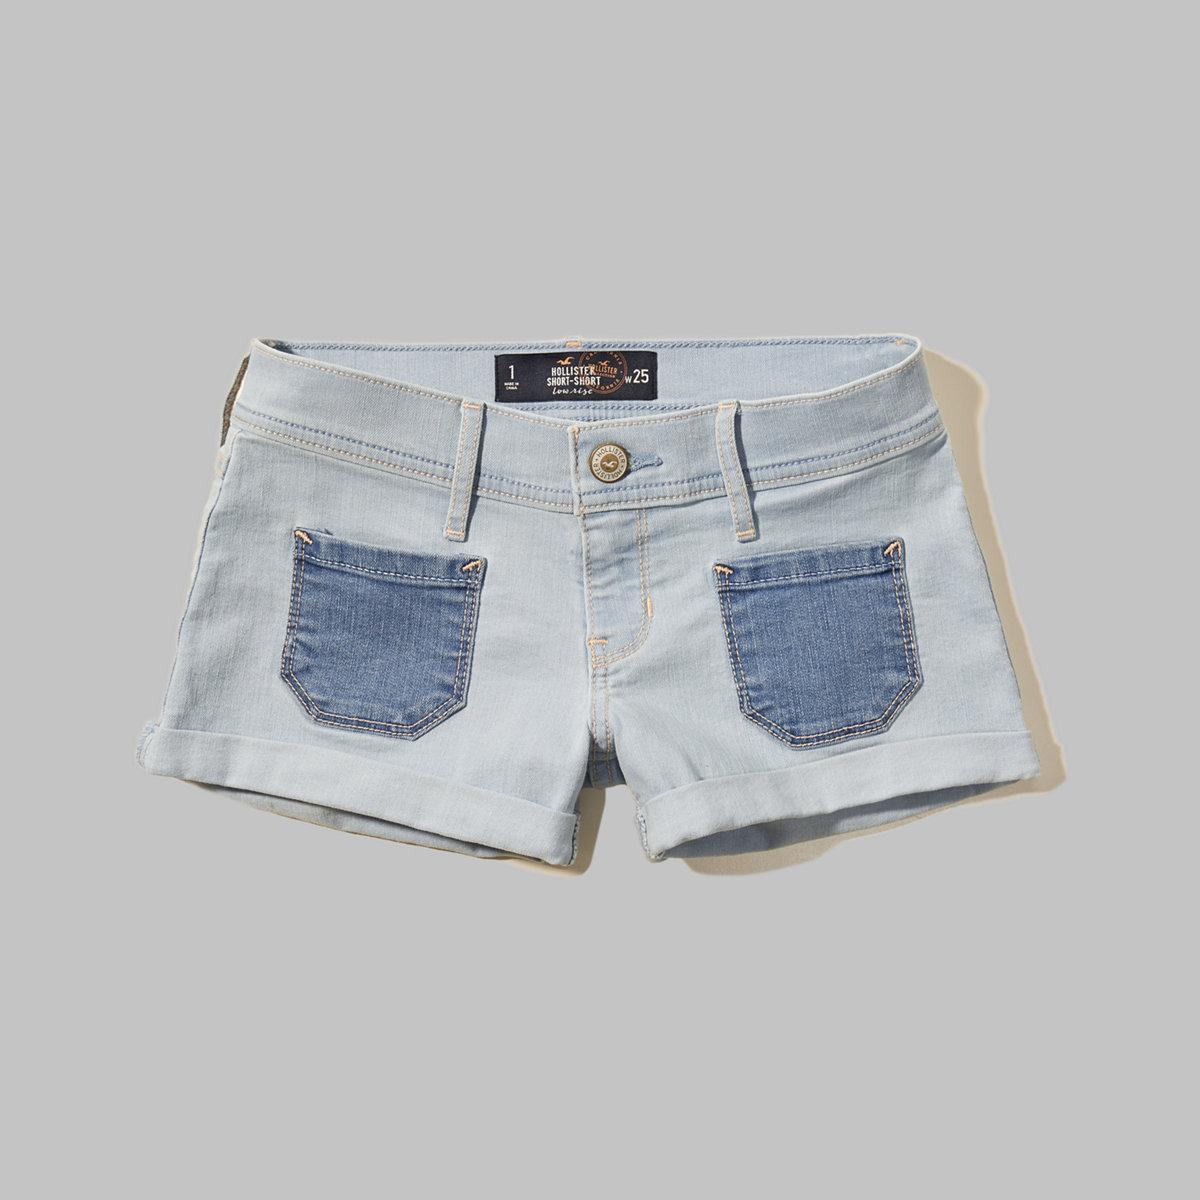 Patch Pocket Low Rise Denim Short-Shorts